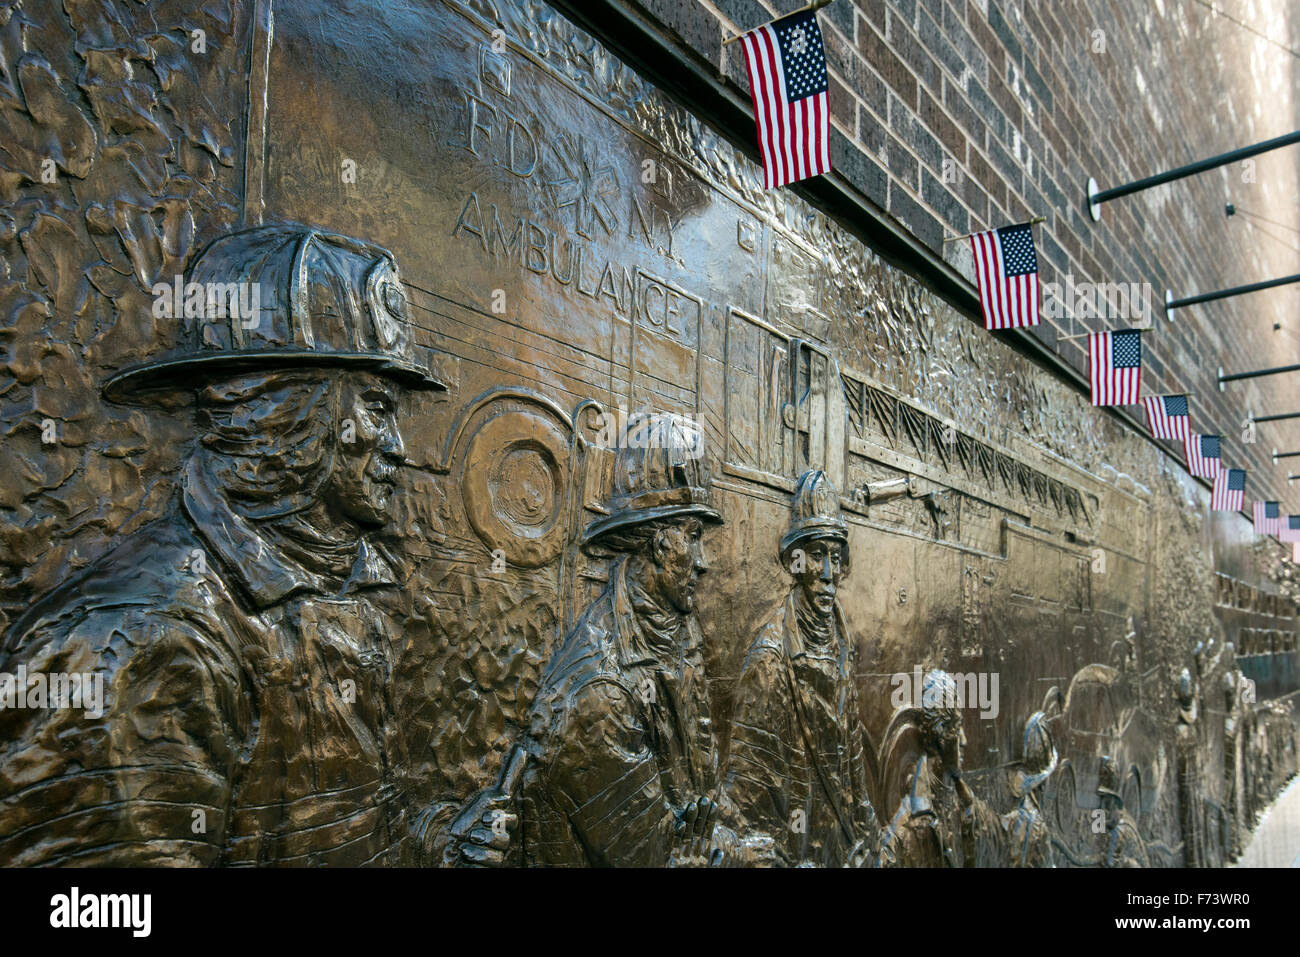 Bronze wall mural dedicated to the fallen firefighters of September 11, World Trade Center, Lower Manhattan, New - Stock Image